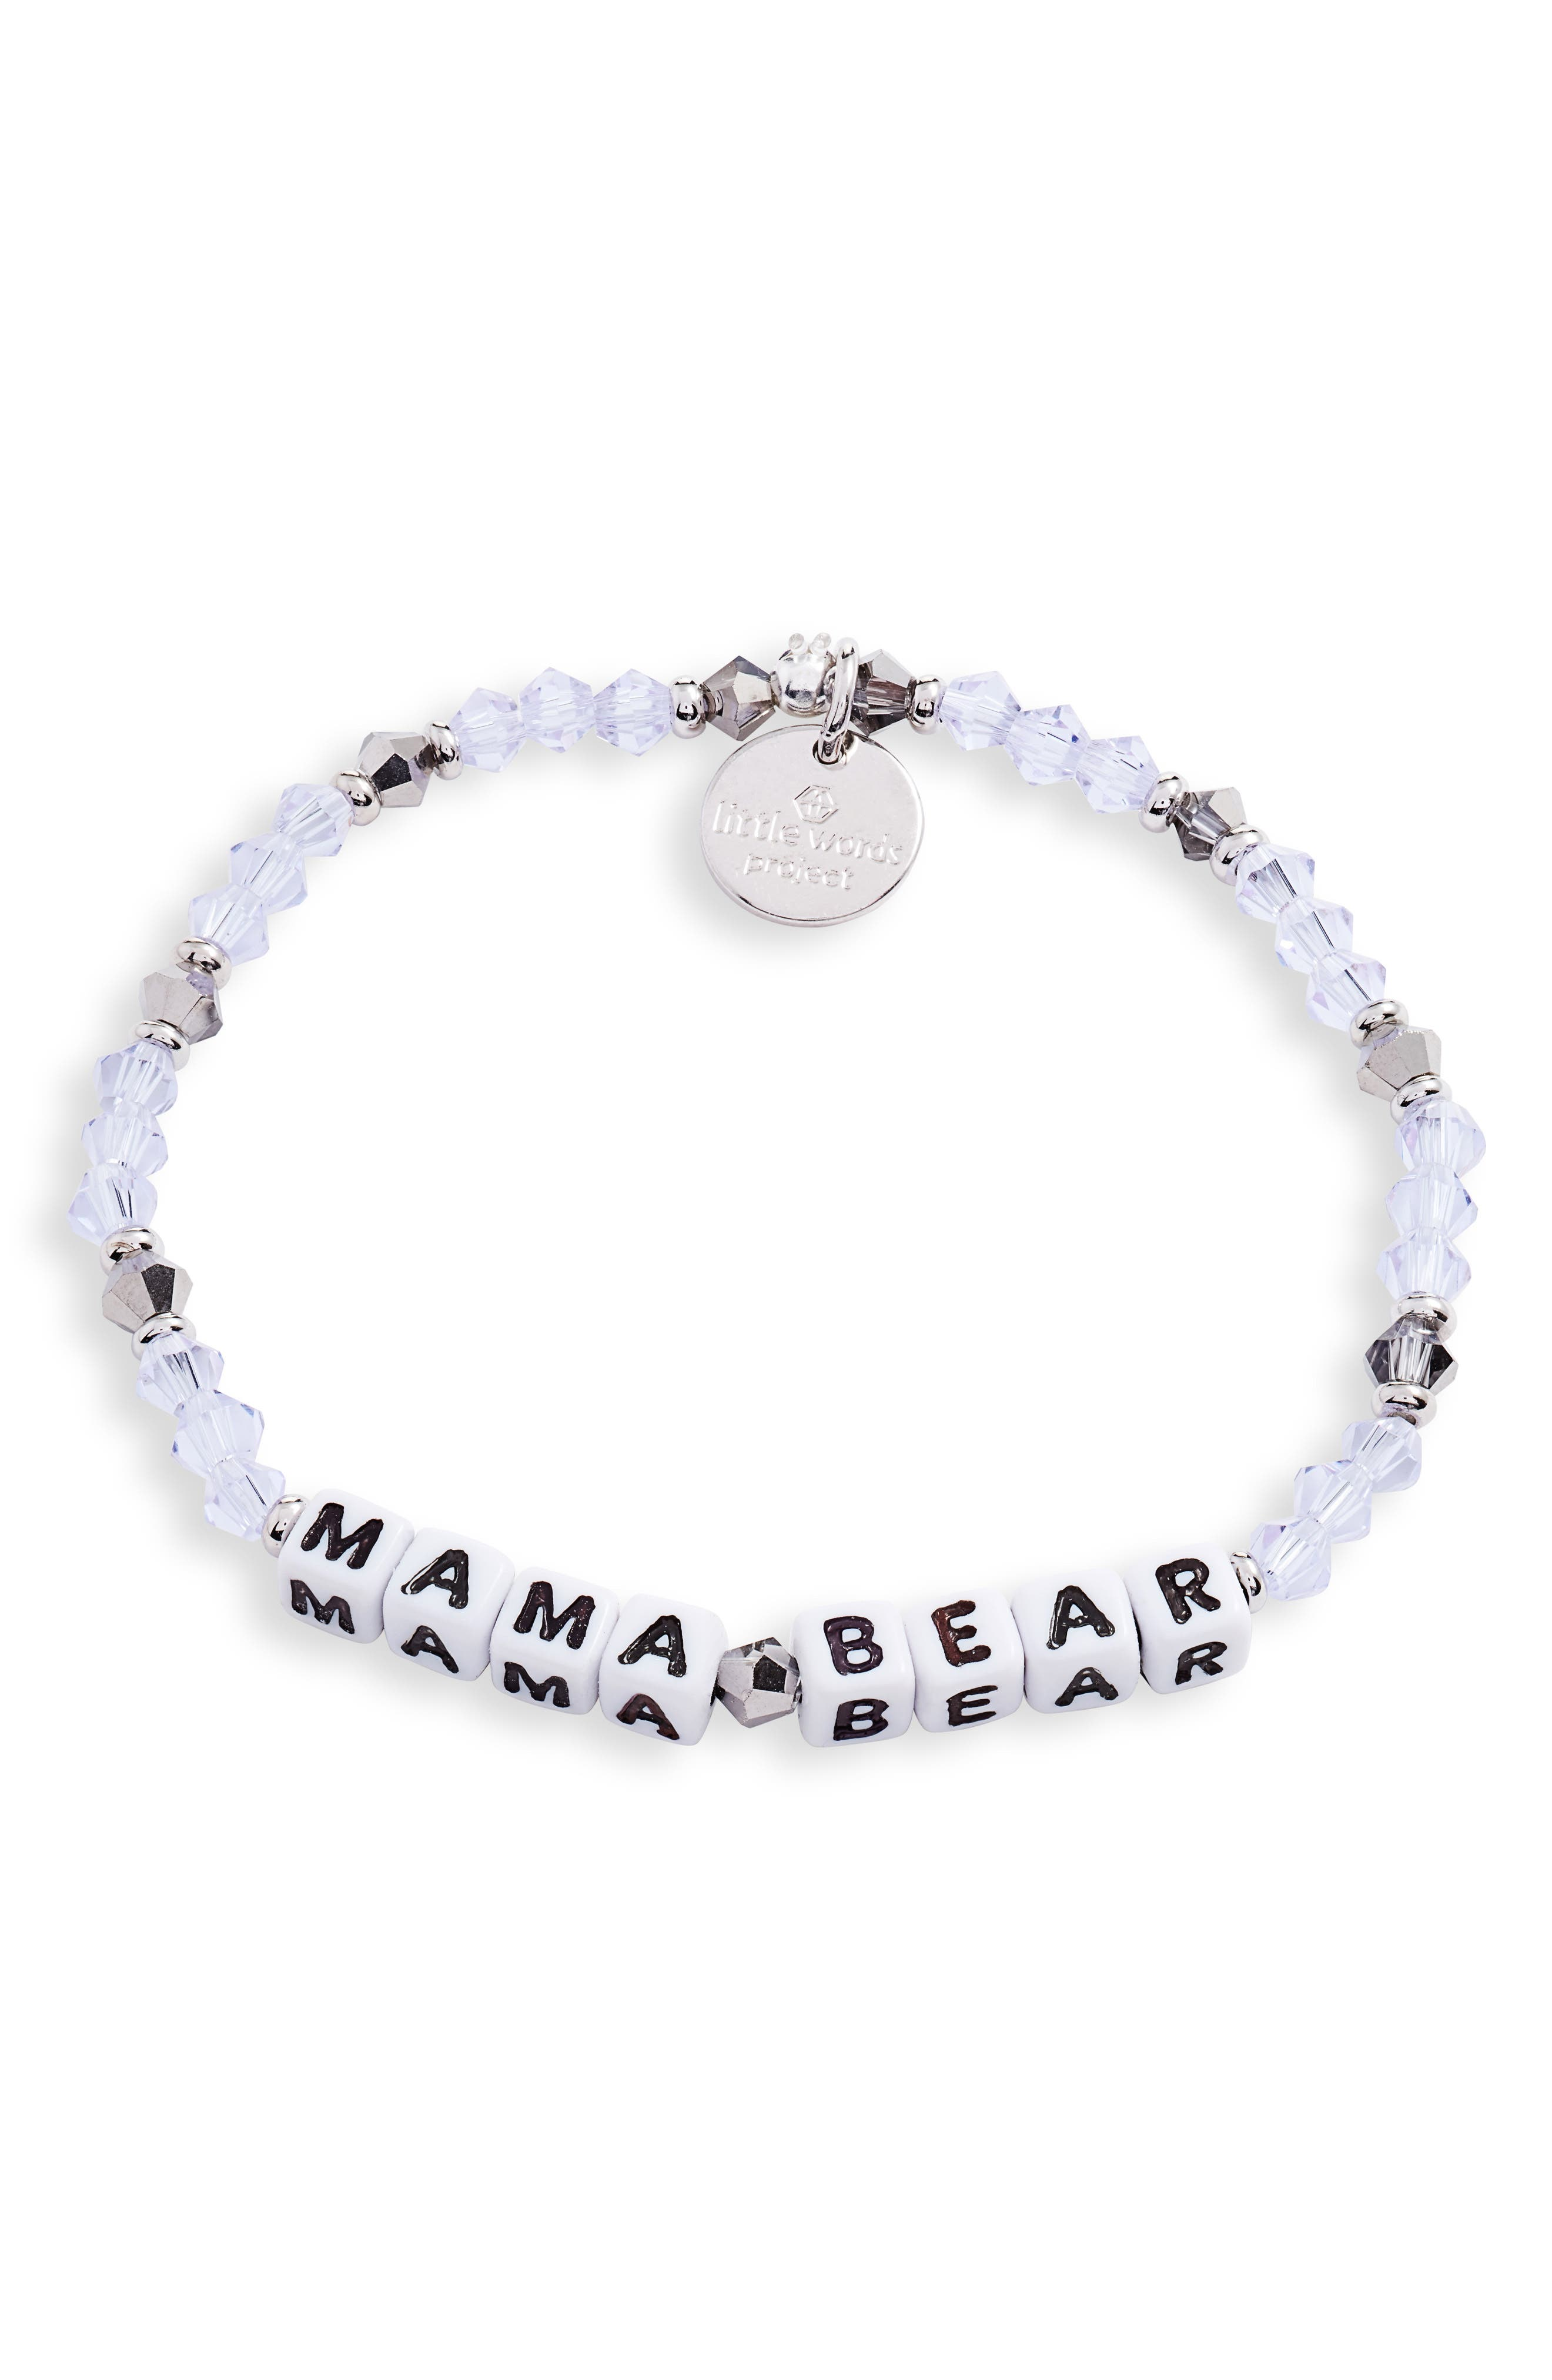 Mama Bear Beaded Stretch Bracelet